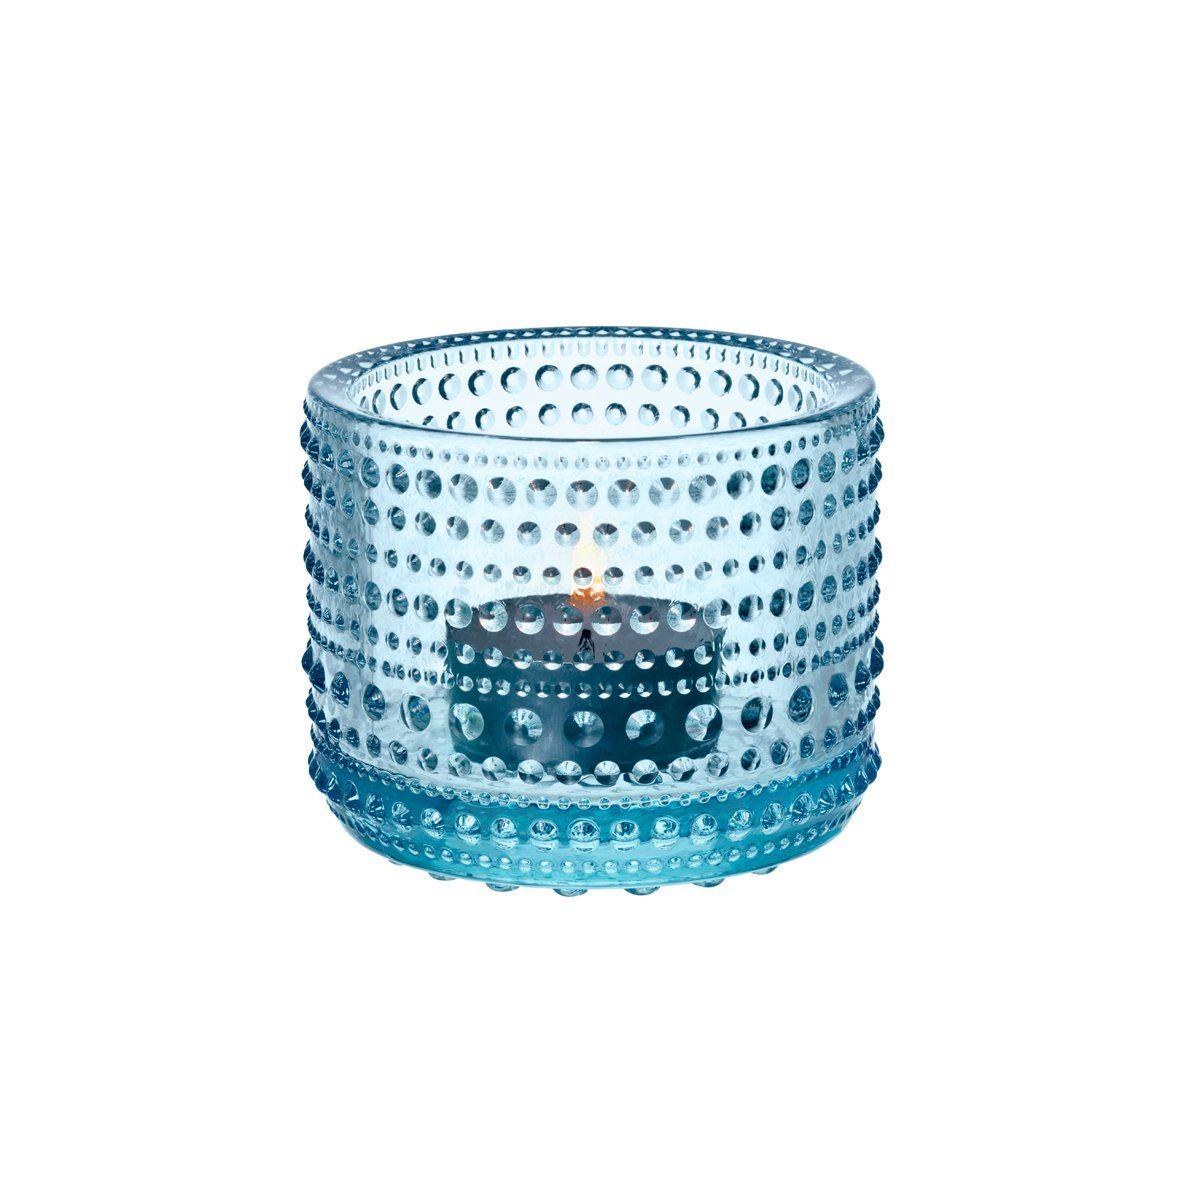 IITTALA Iittala Teelichthalter KASTEHELMI hellblau 6.4 cm